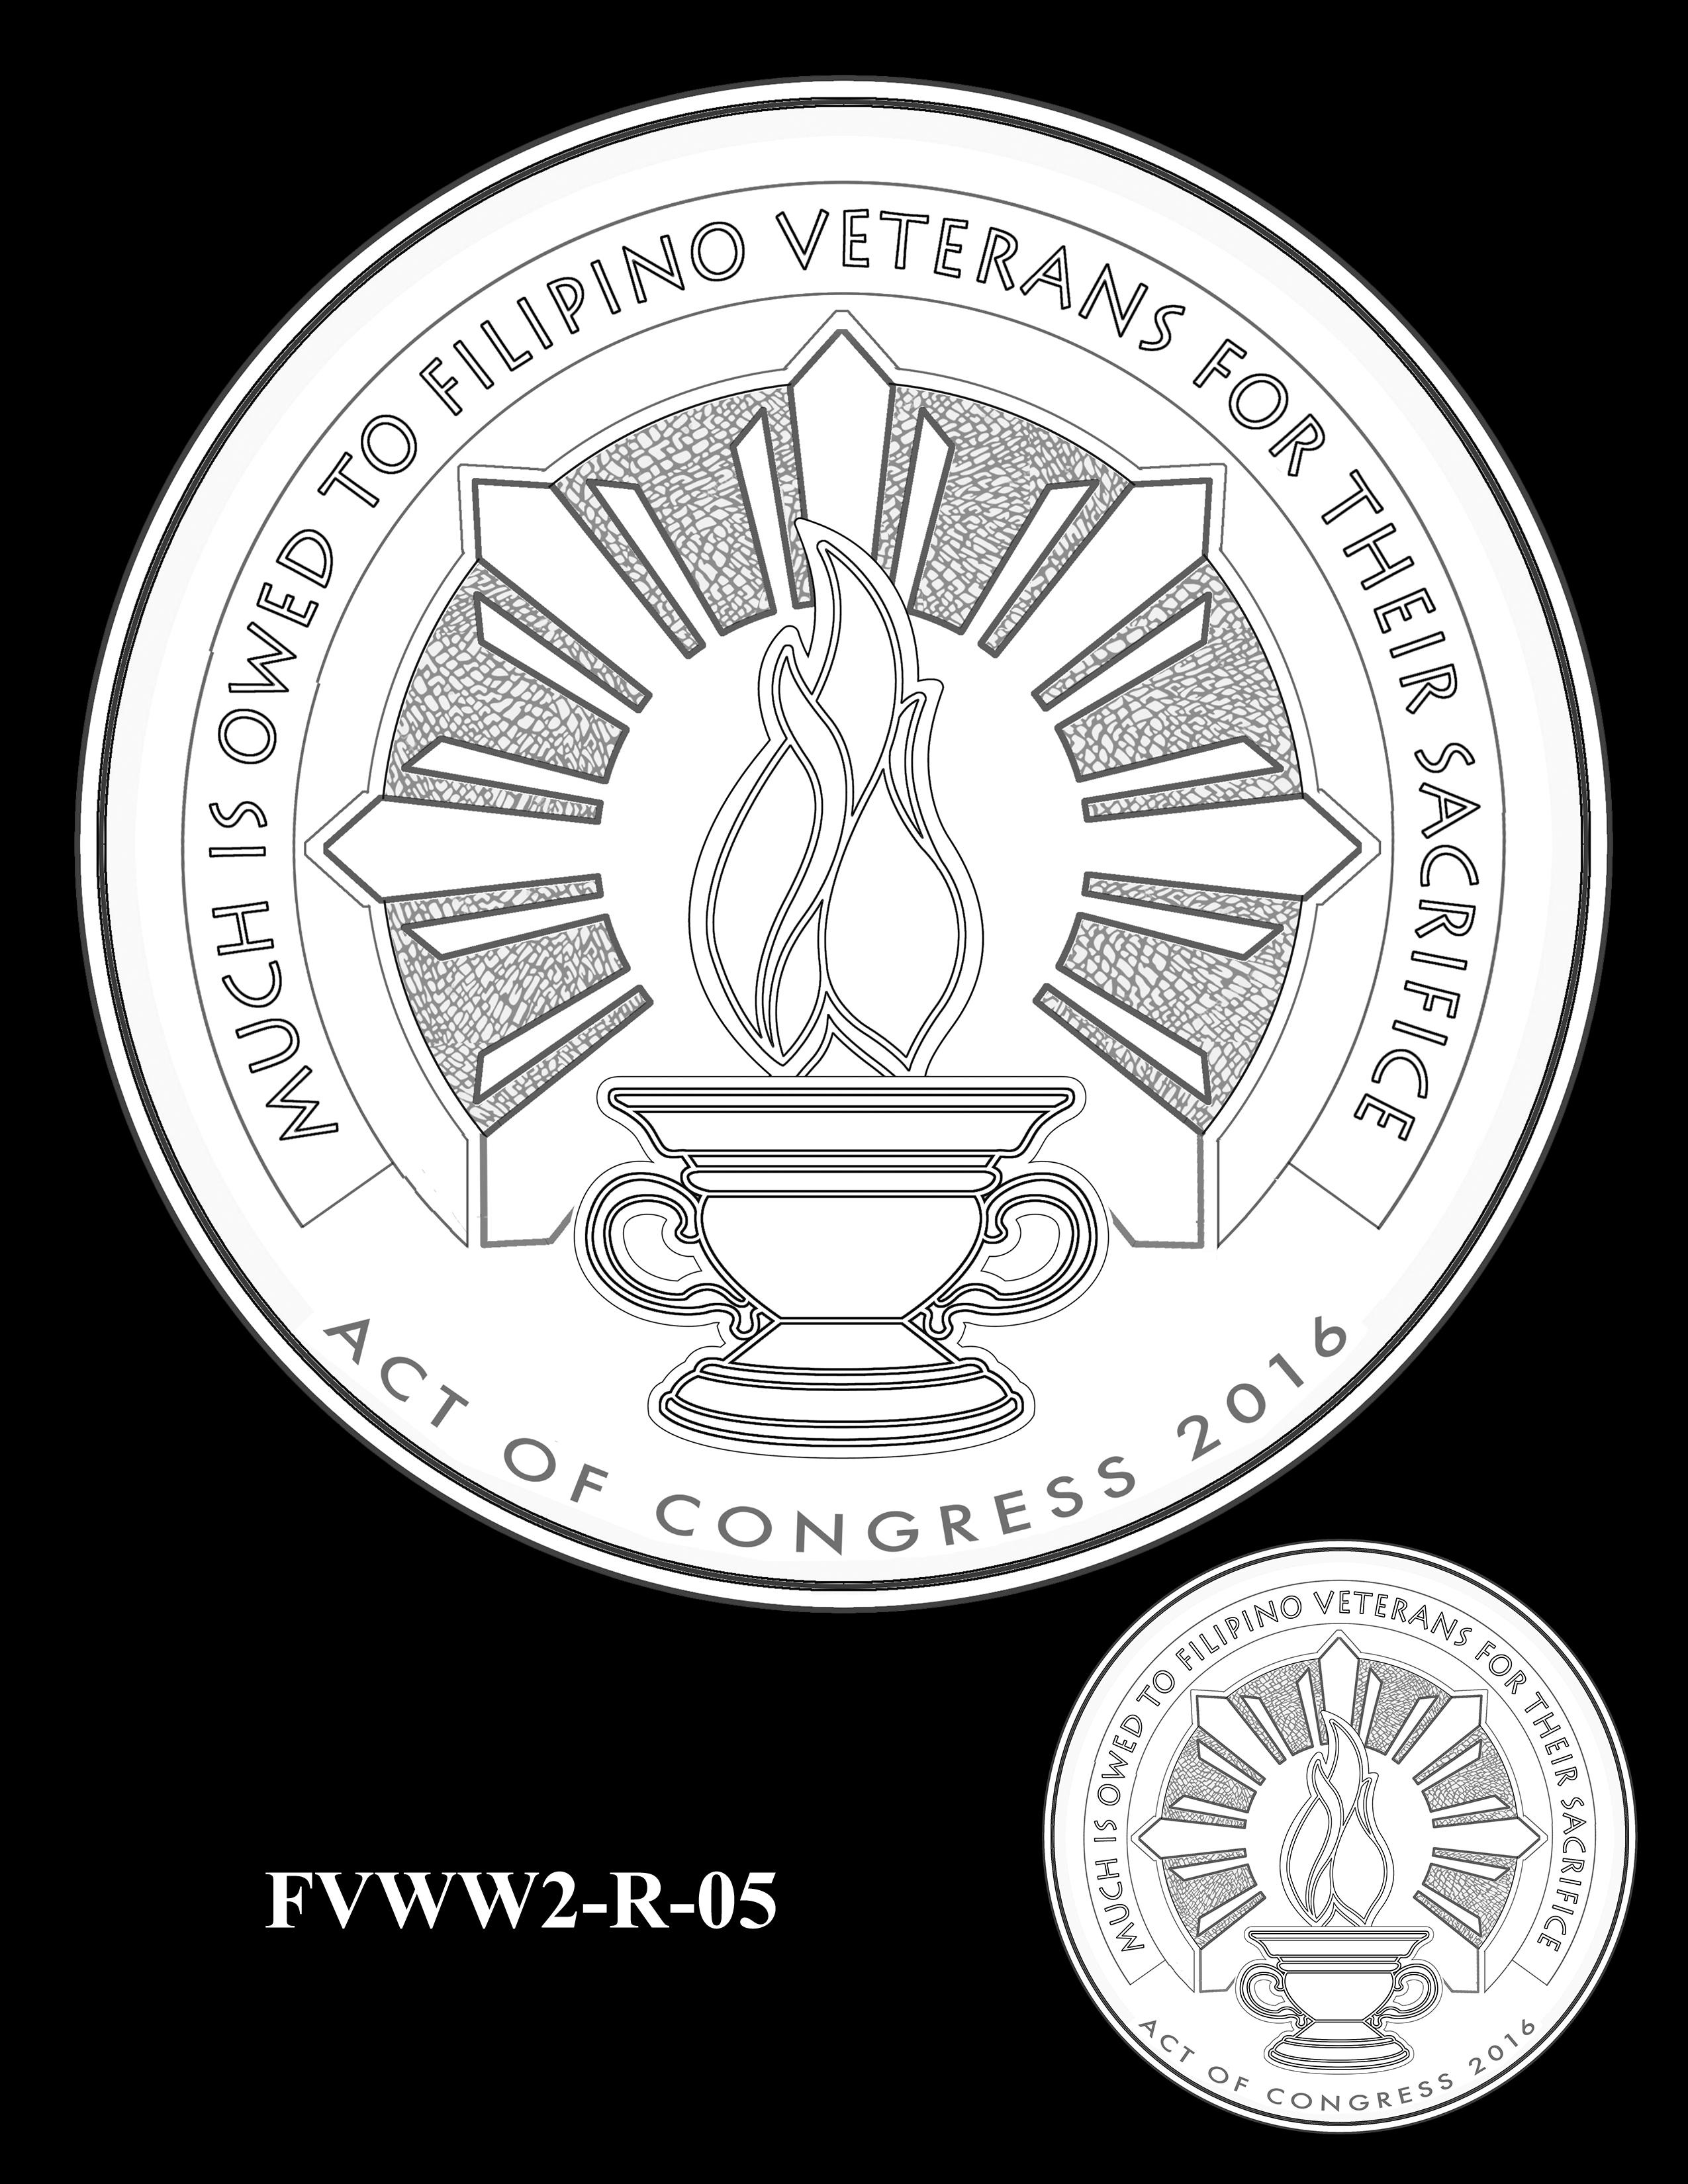 FVWW2-R-05 -- Filipino Veterans of World War II Congressional Gold Medal